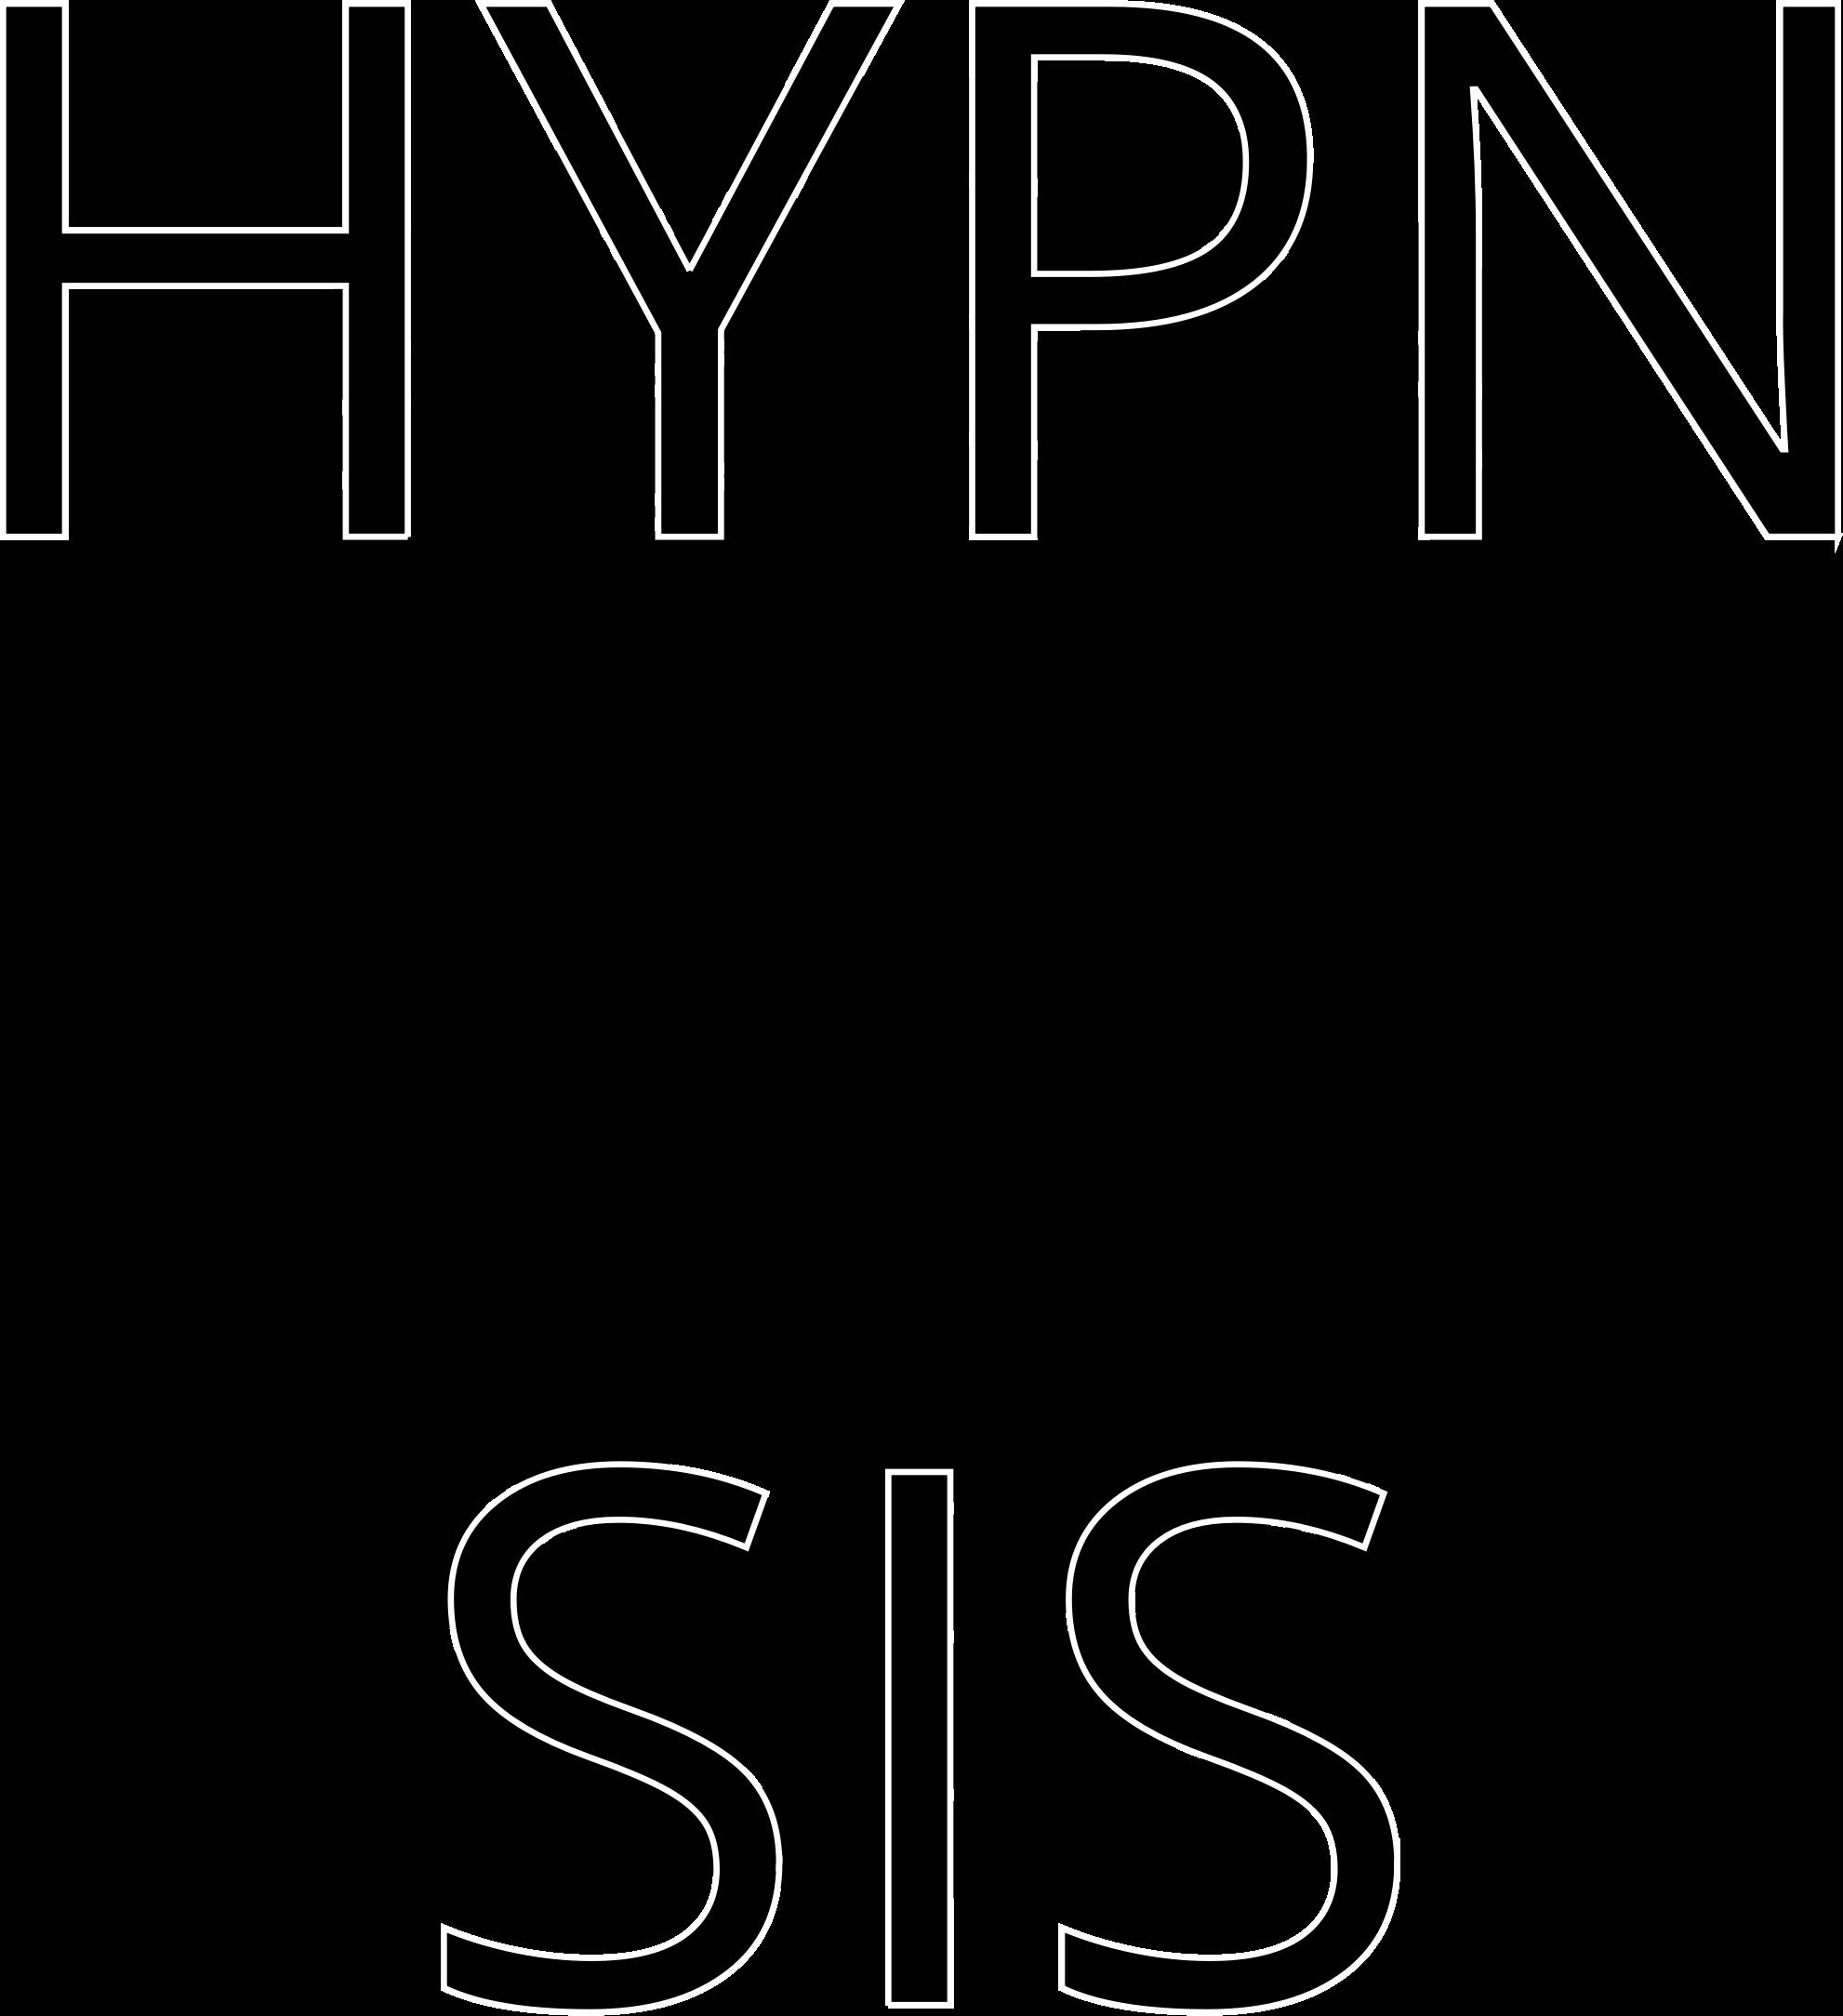 Clipart eyes hypnotized. Hypnosis symbol big image